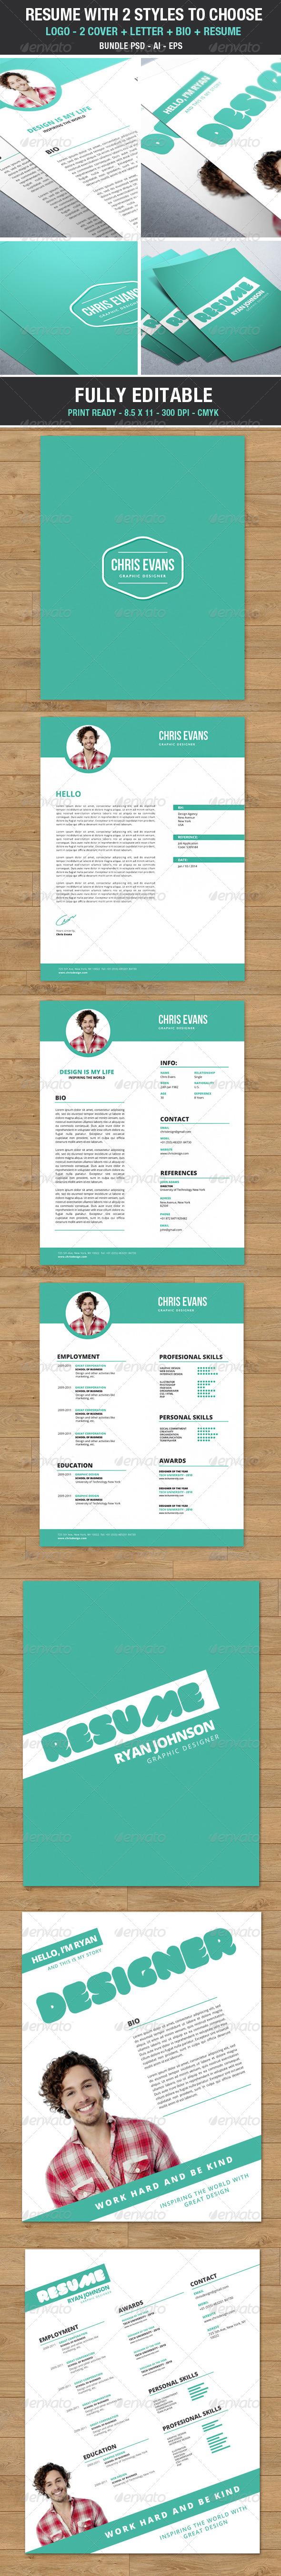 Clean Modern Resume 2 styles to choose - Bundle - Resumes Stationery